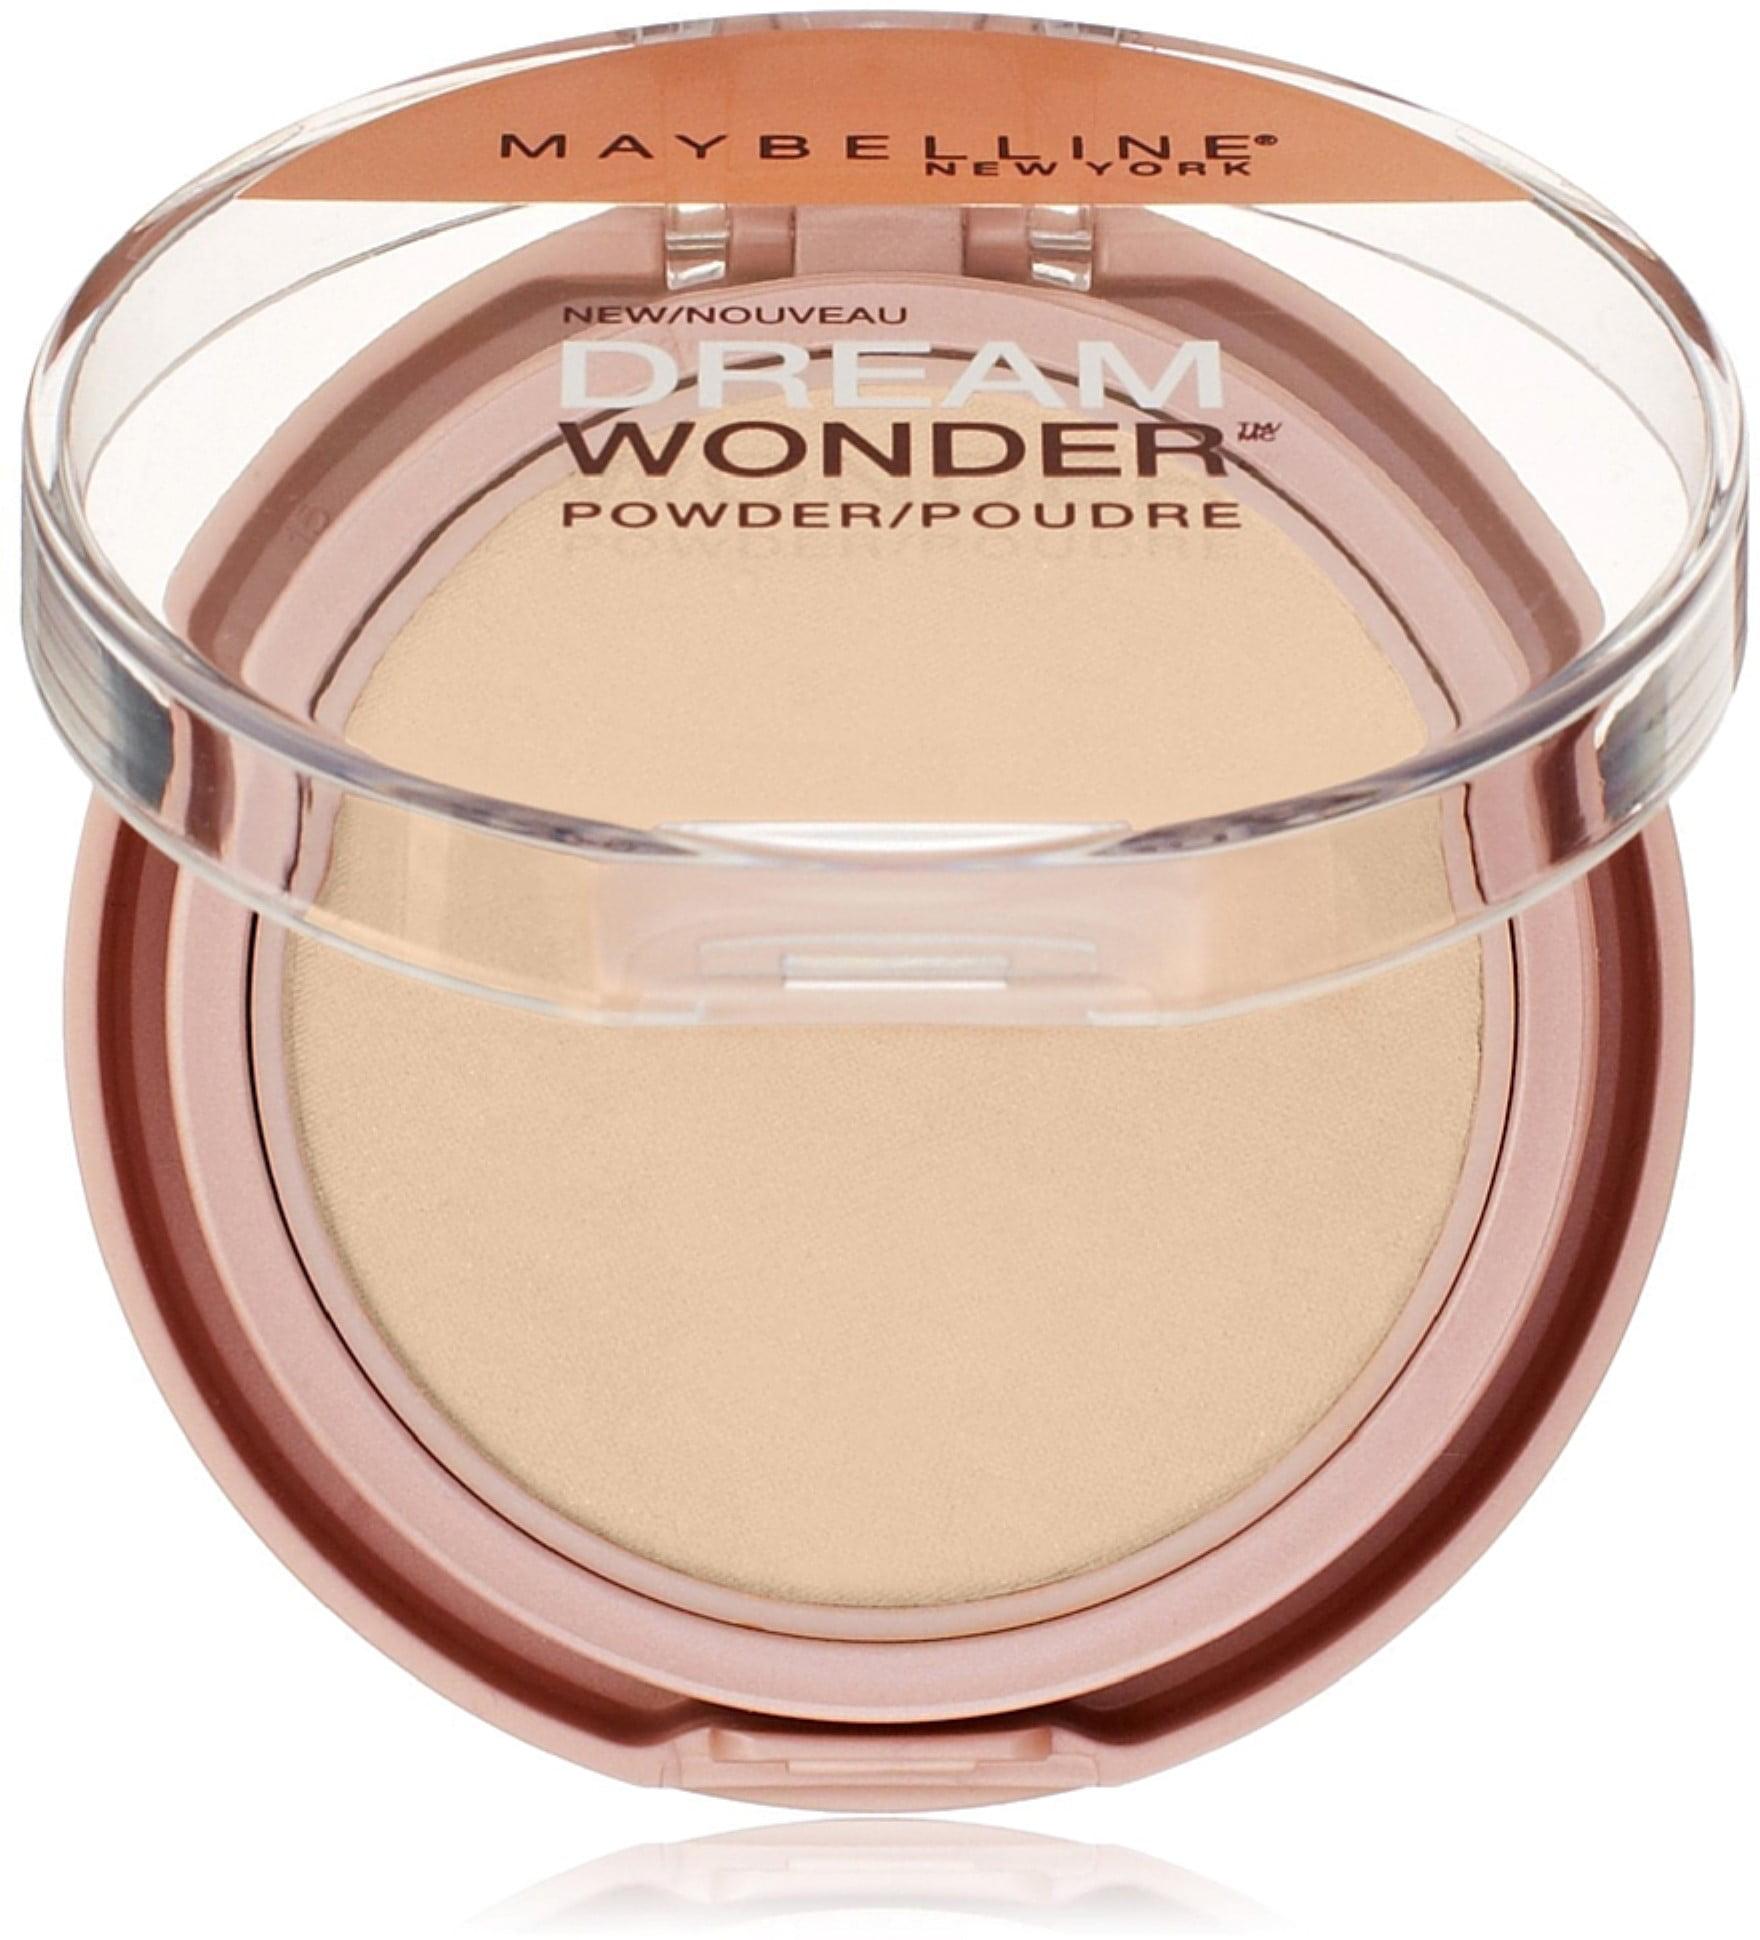 Maybelline New York Dream Wonder Powder, Sandy Beige [60] 0.19 oz (Pack of 3)